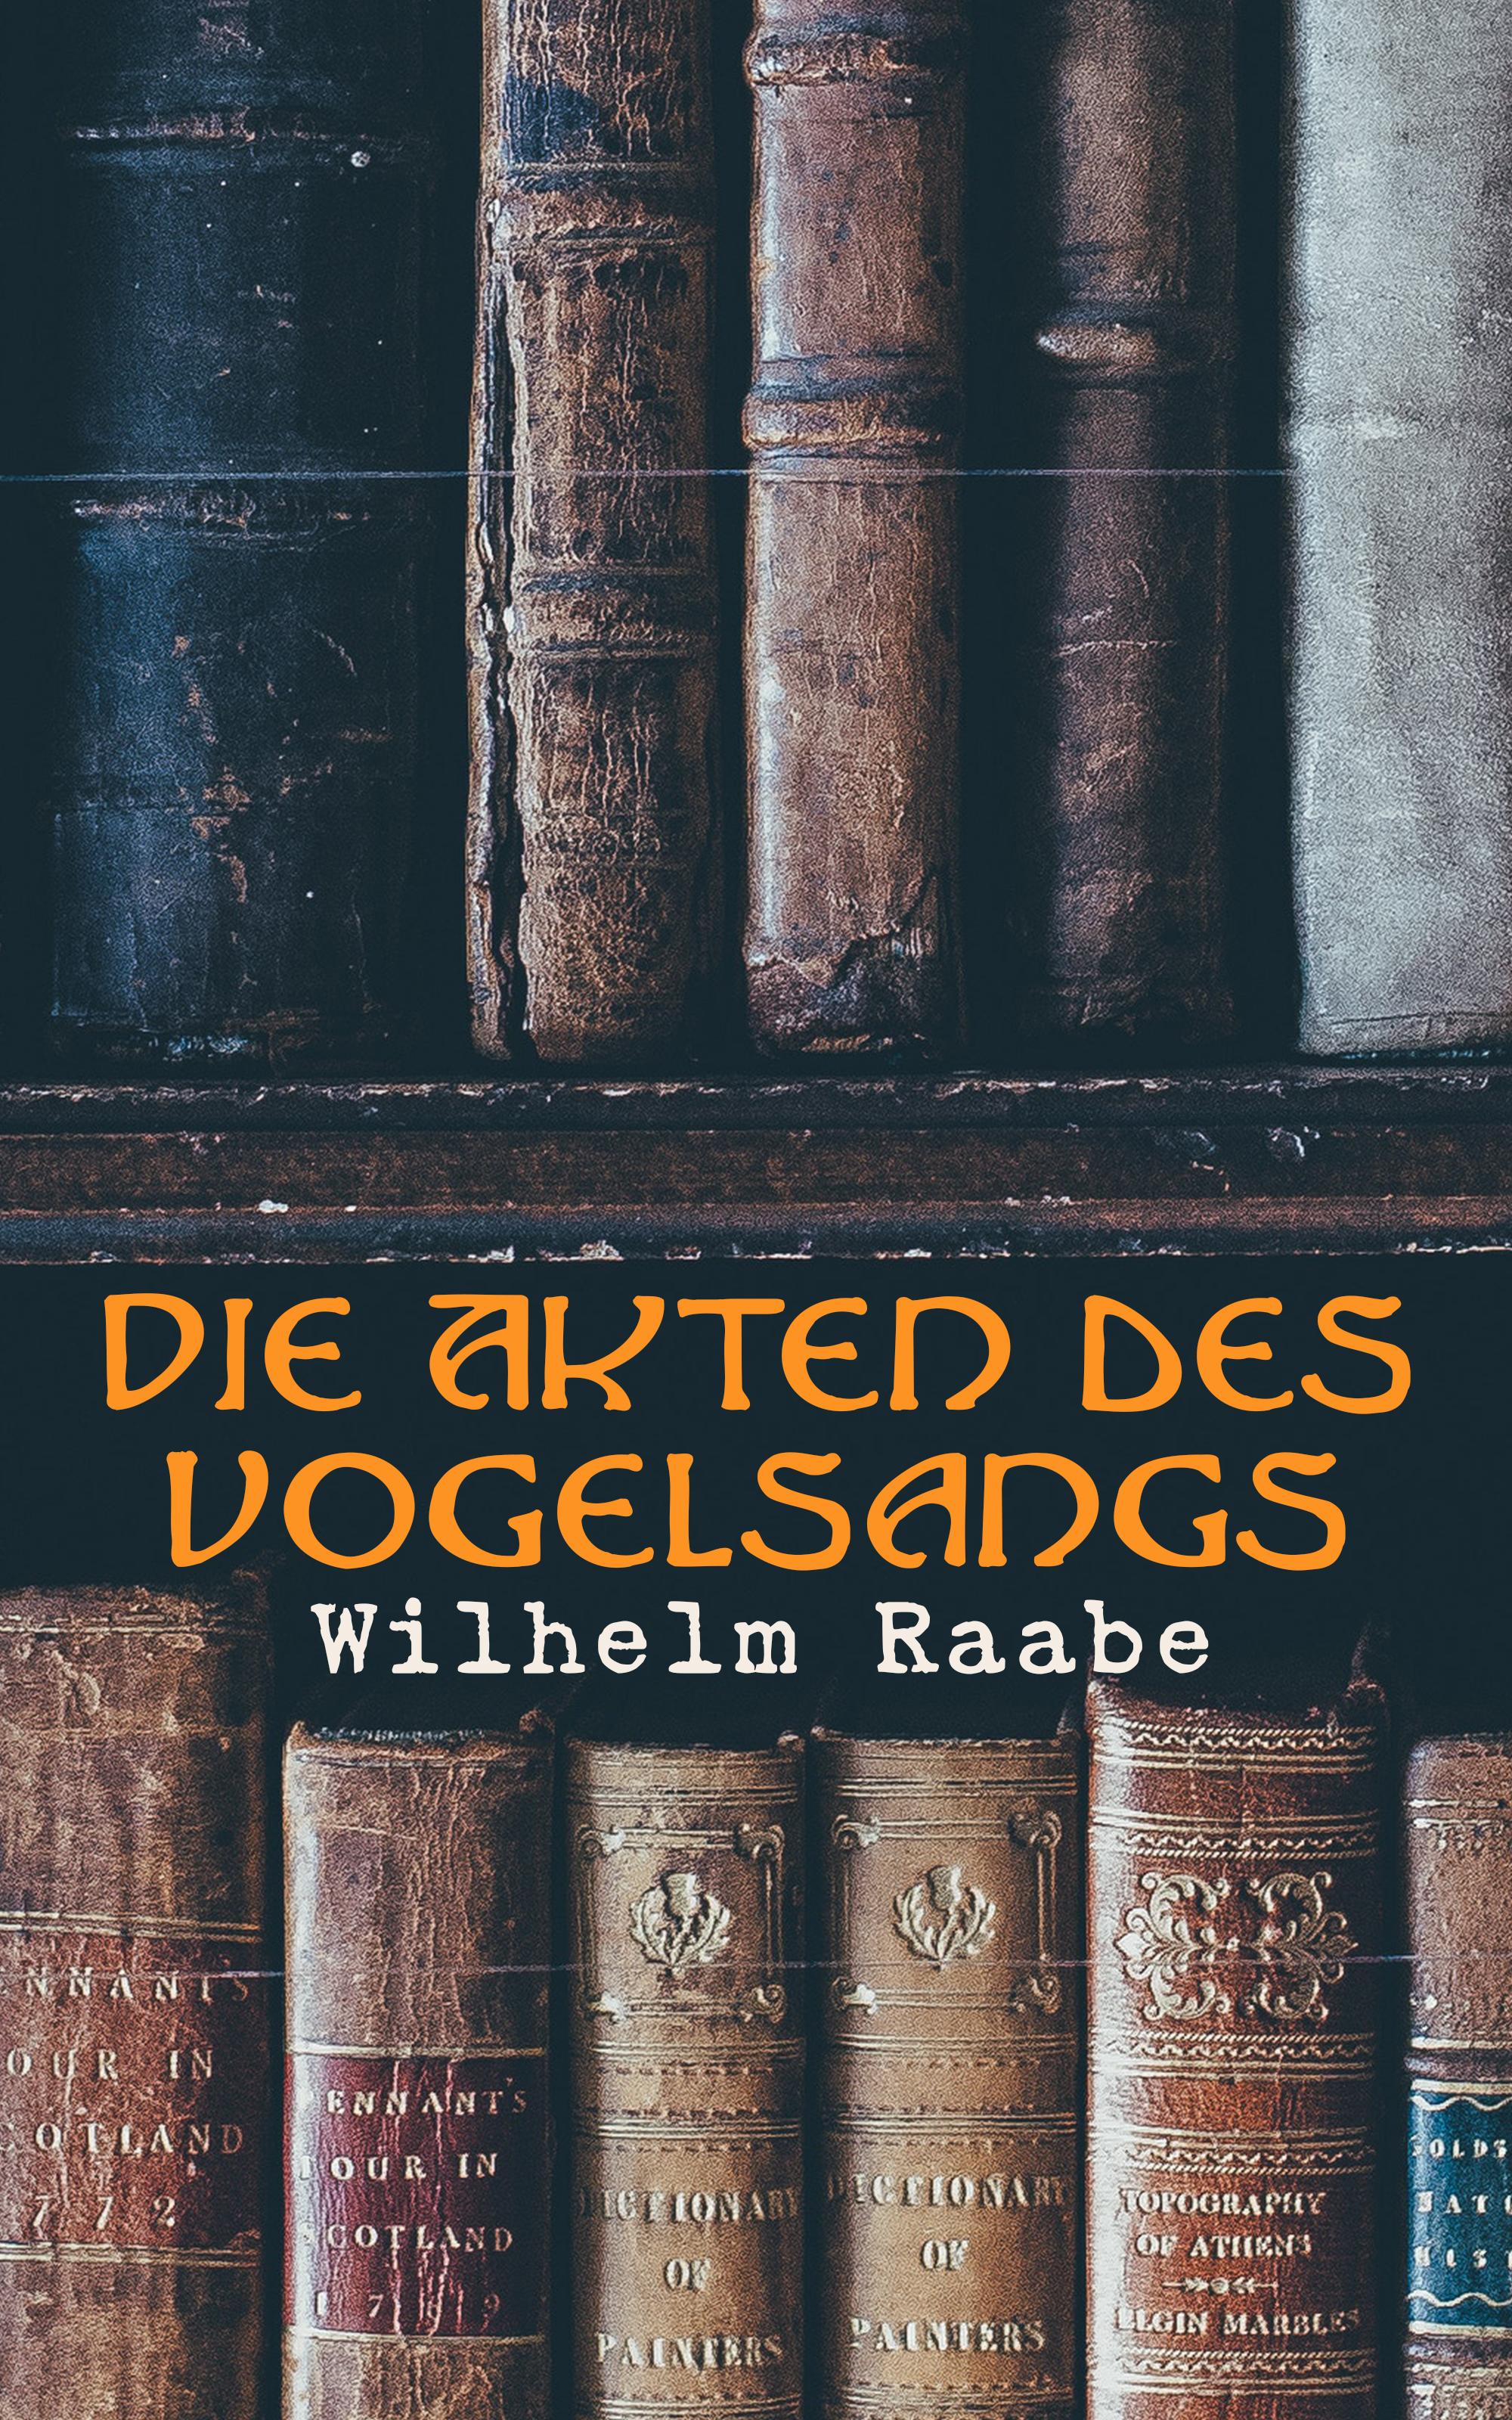 Wilhelm Raabe Die Akten des Vogelsangs недорого